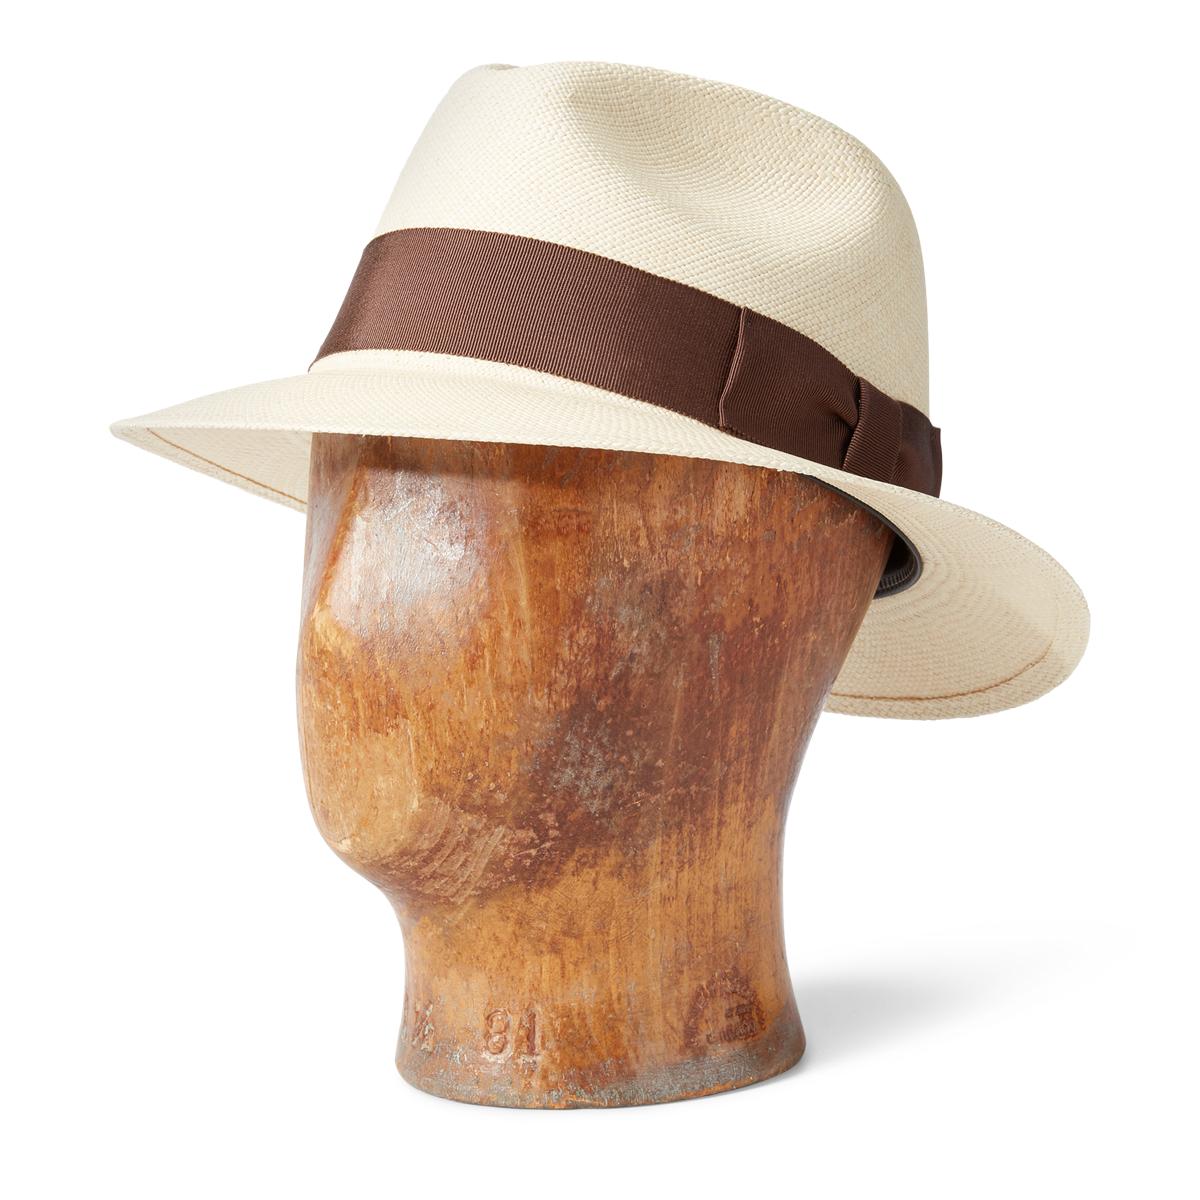 0275e80df91263 Handwoven Straw Panama Hat